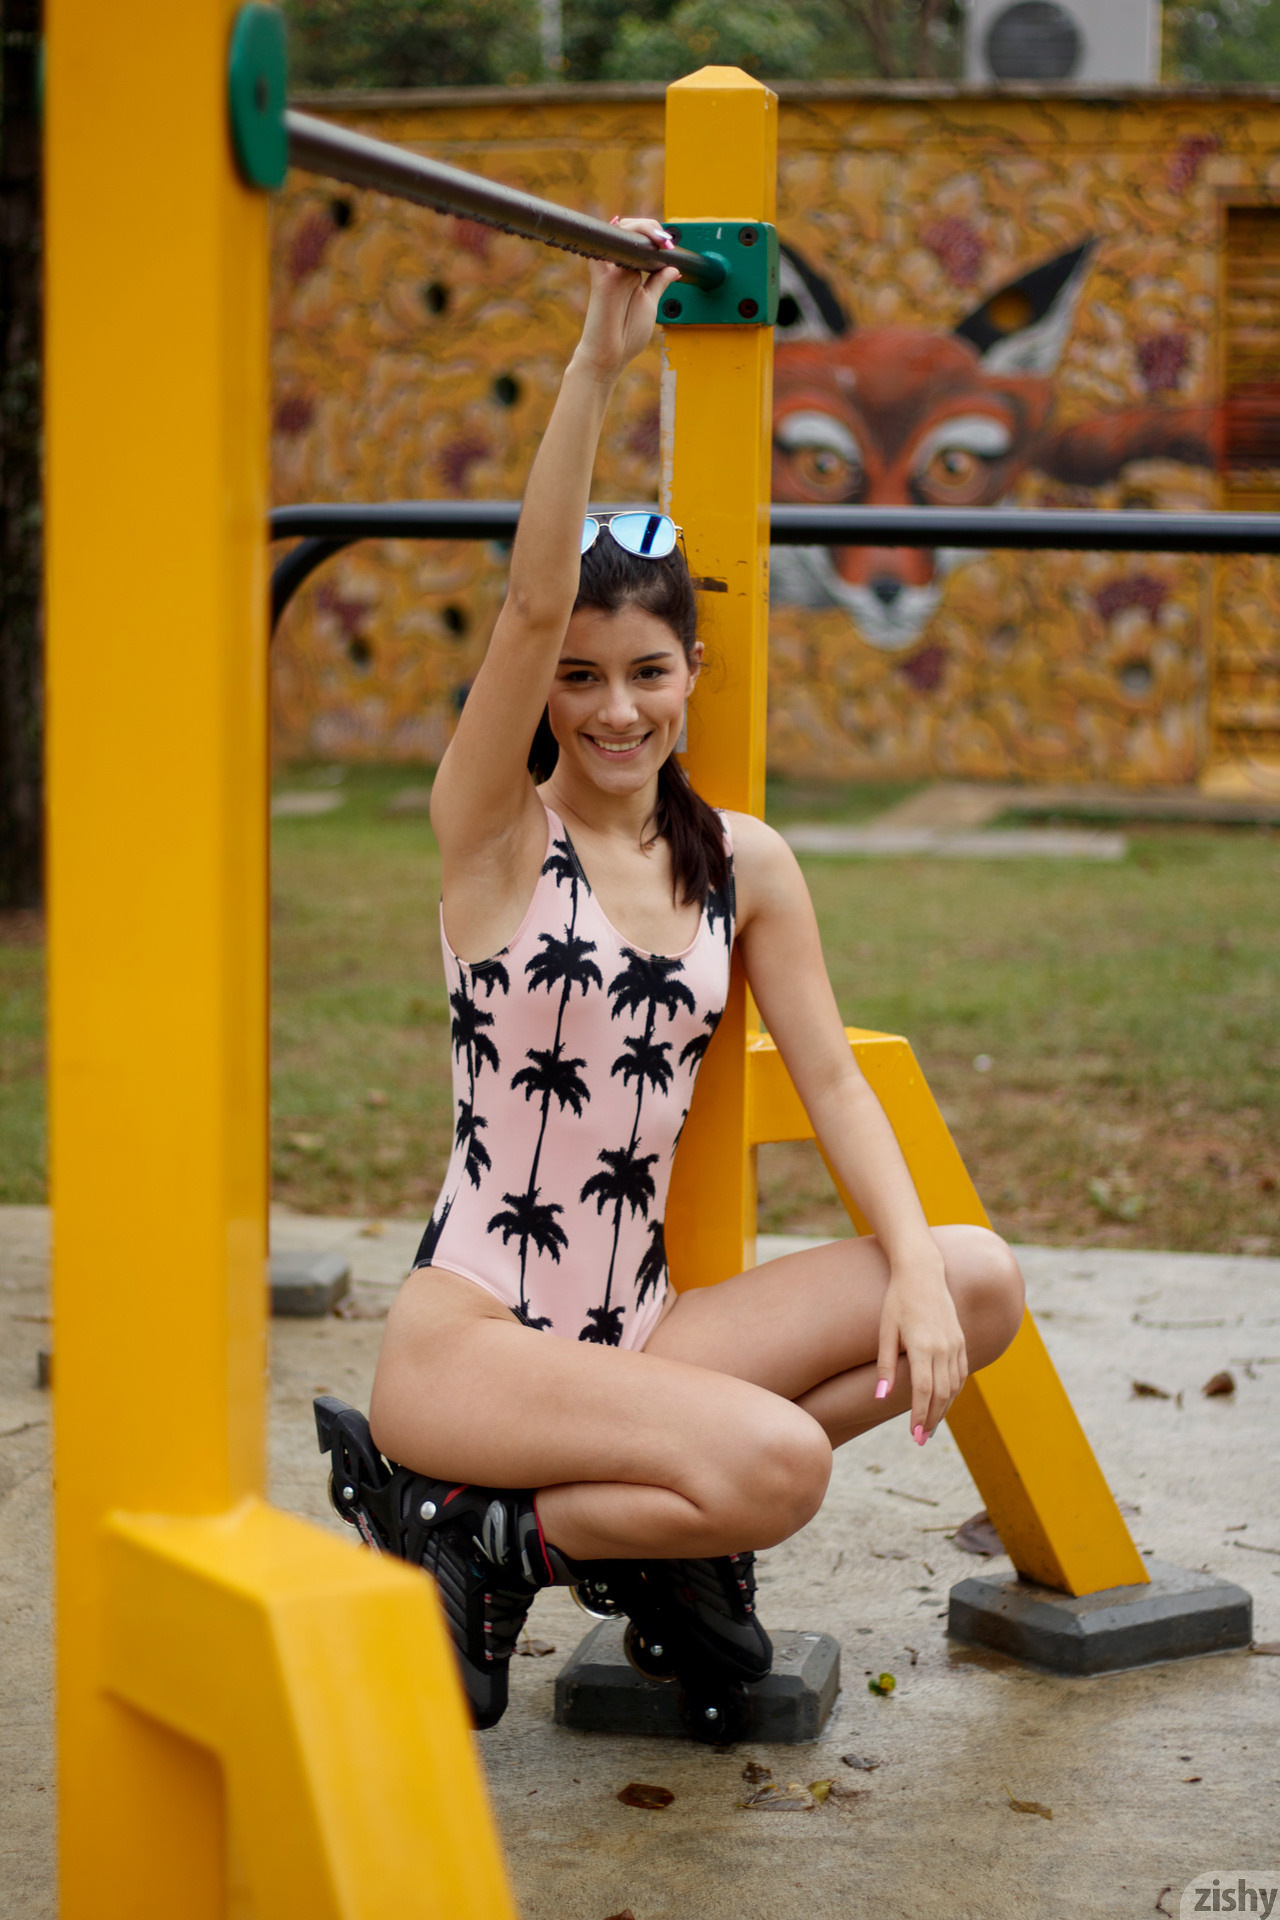 Kate Maze Skates Colombia Zishy (61)